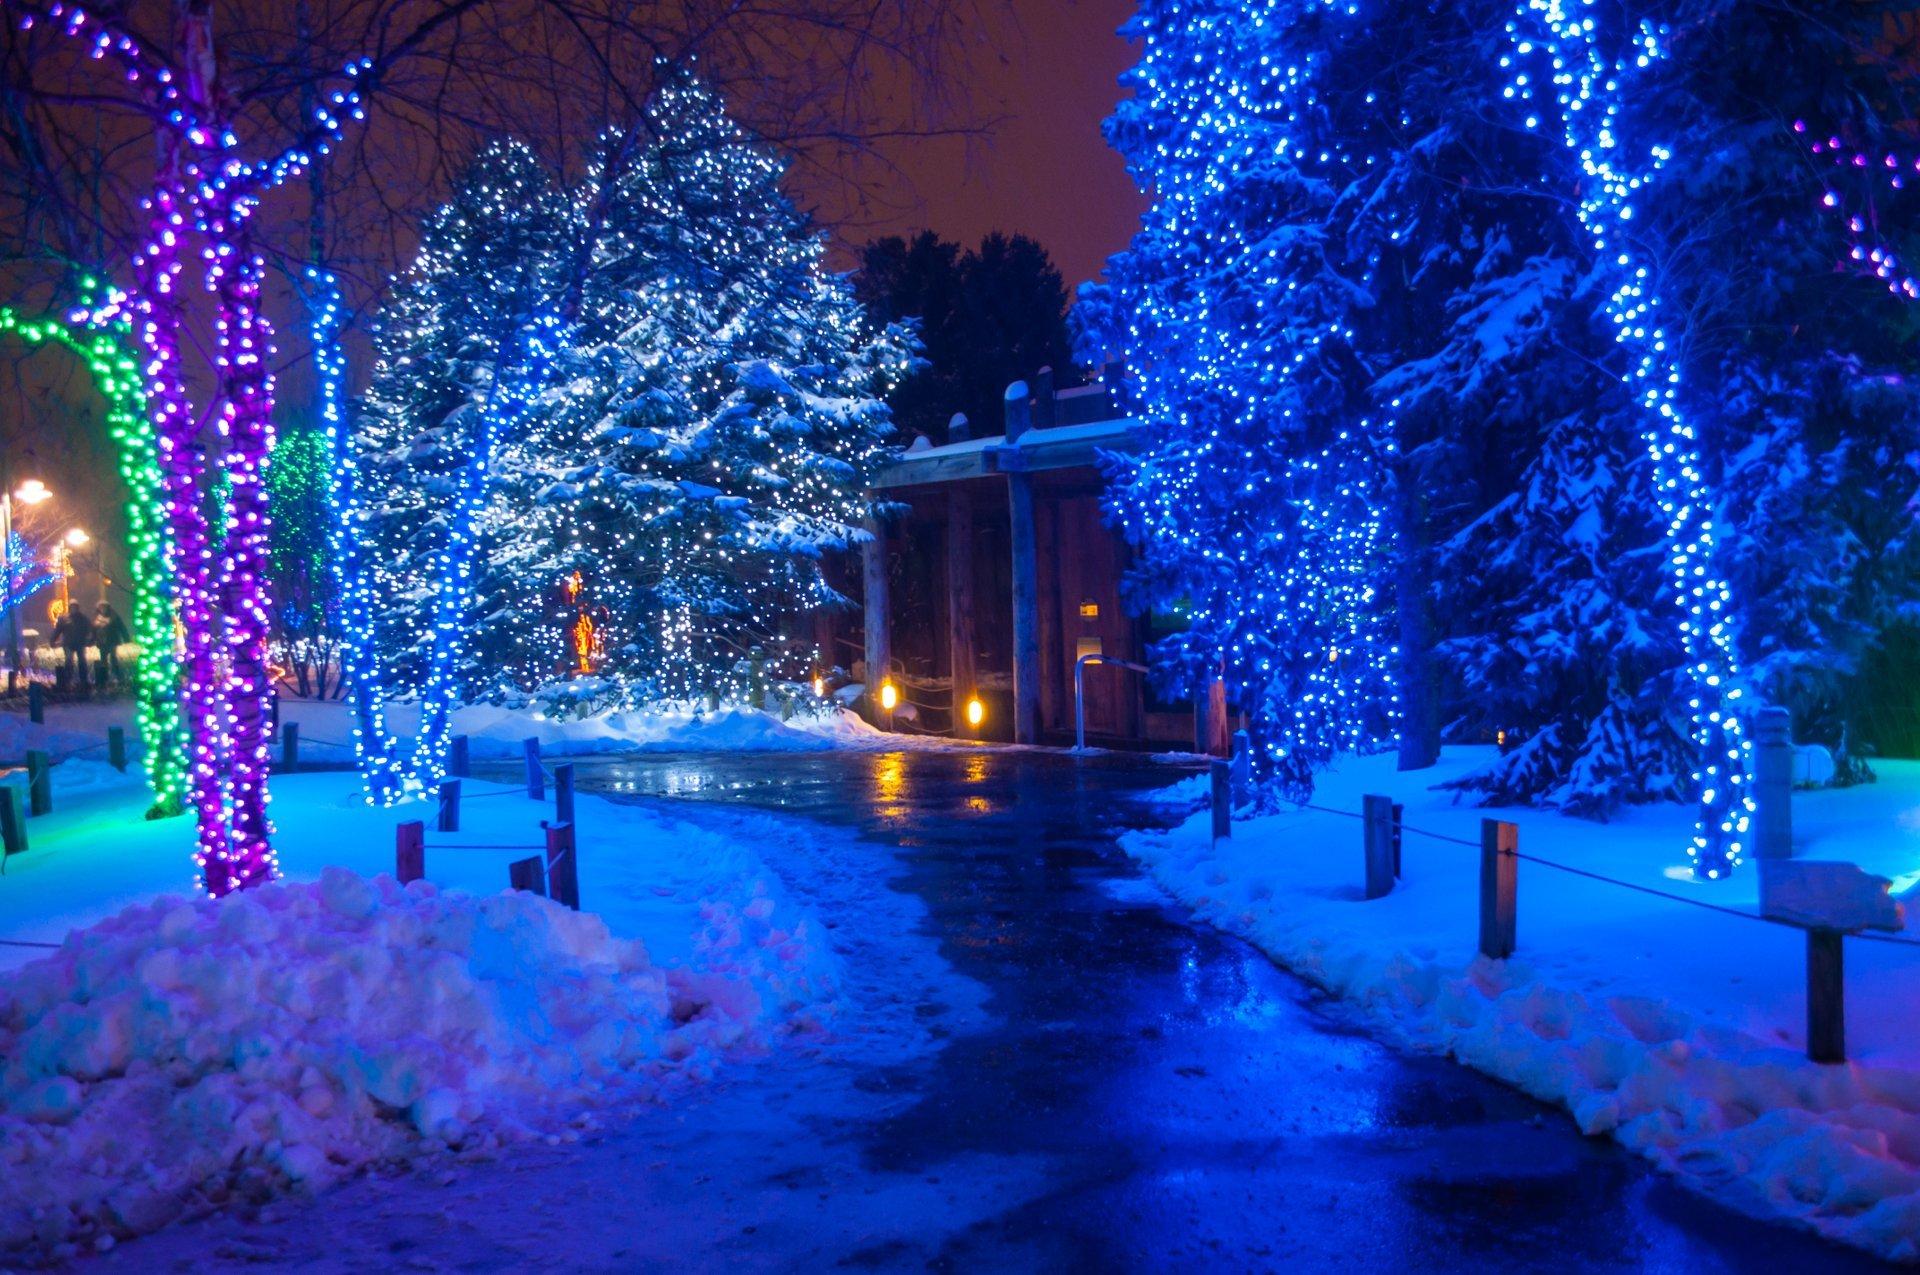 Christmas Lights Ohio 2020 Christmas Lights 2020 2021 in Ohio   Dates & Map